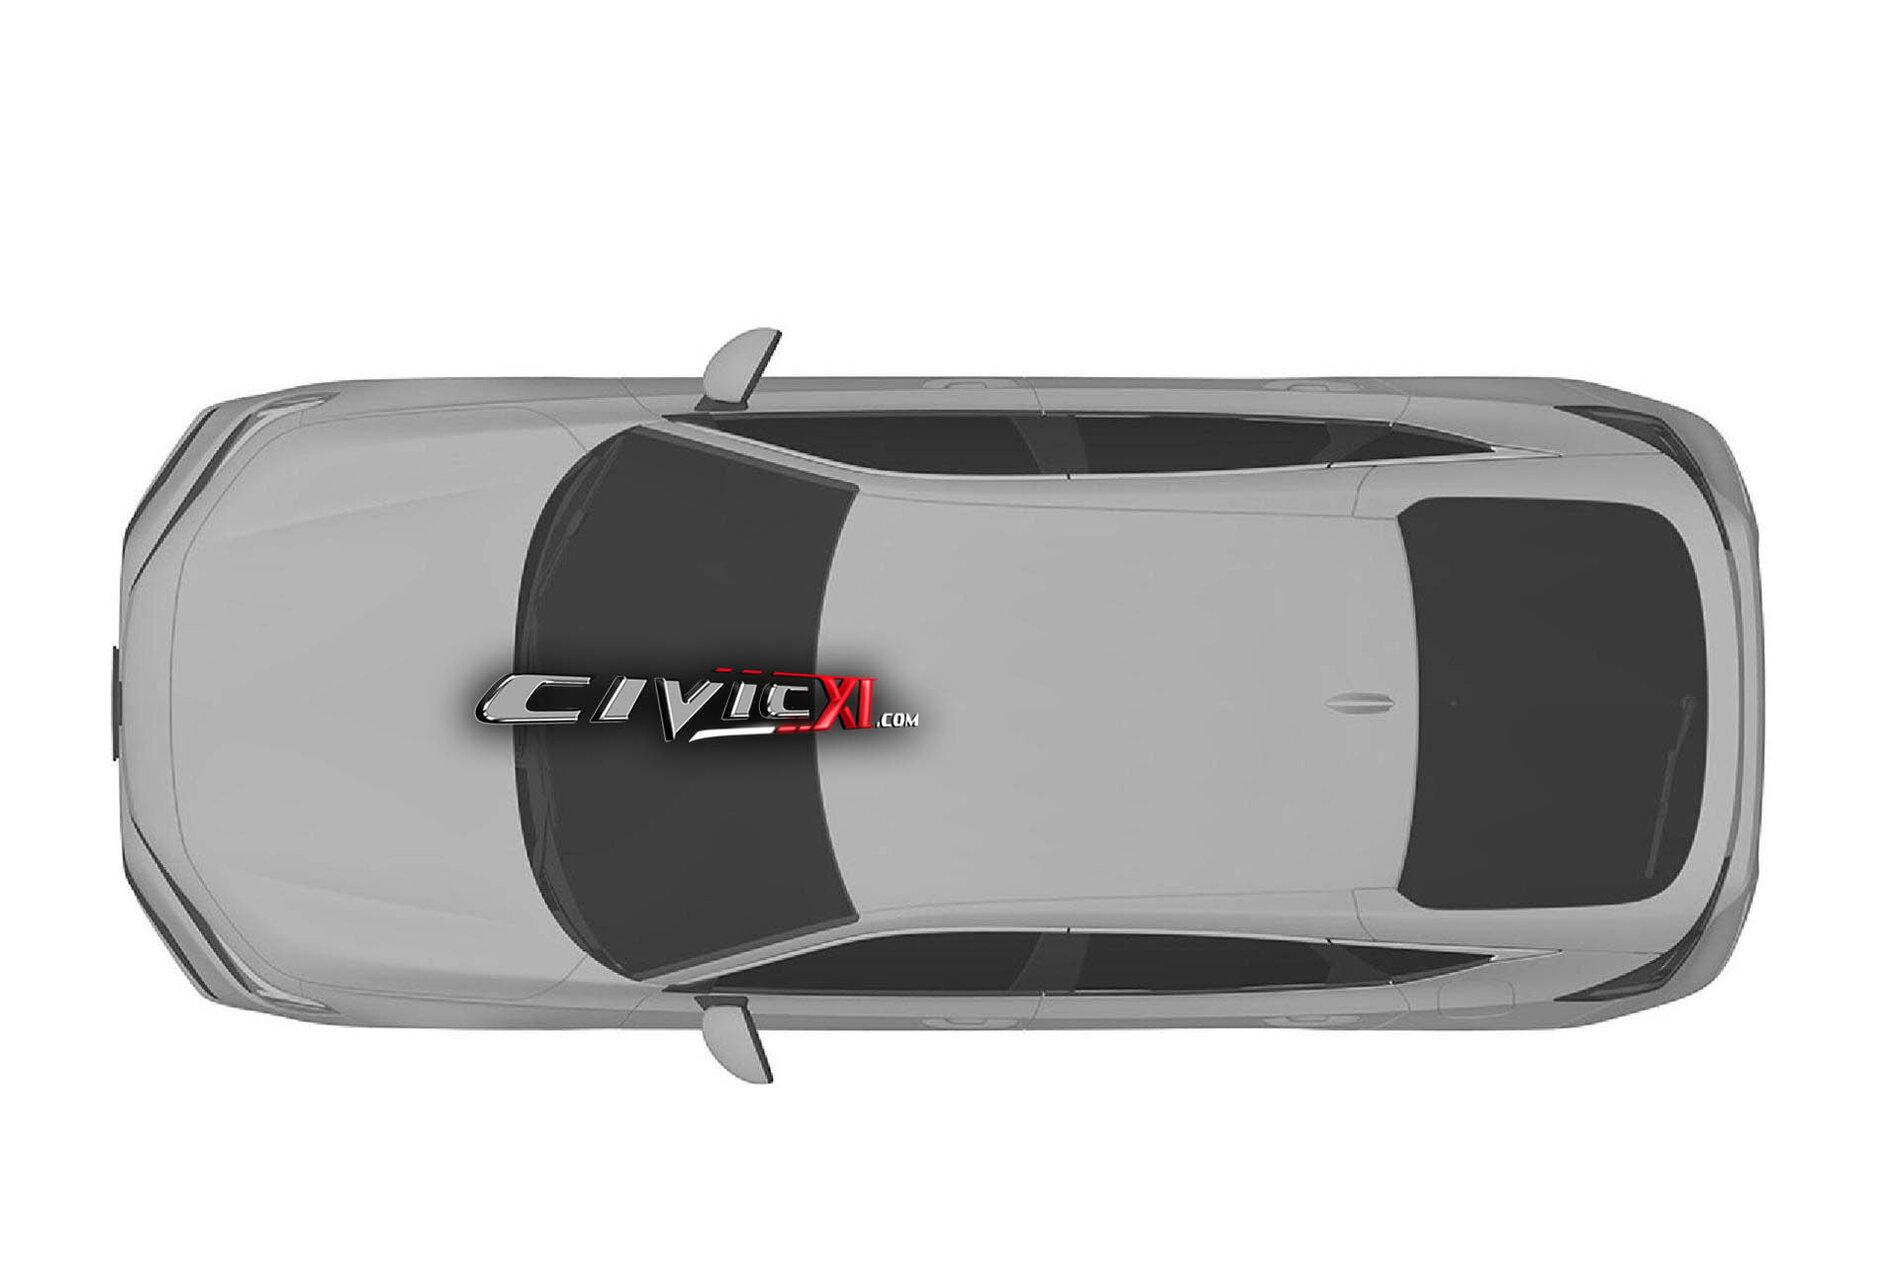 2022-Honda-Civic-Hatchback-6